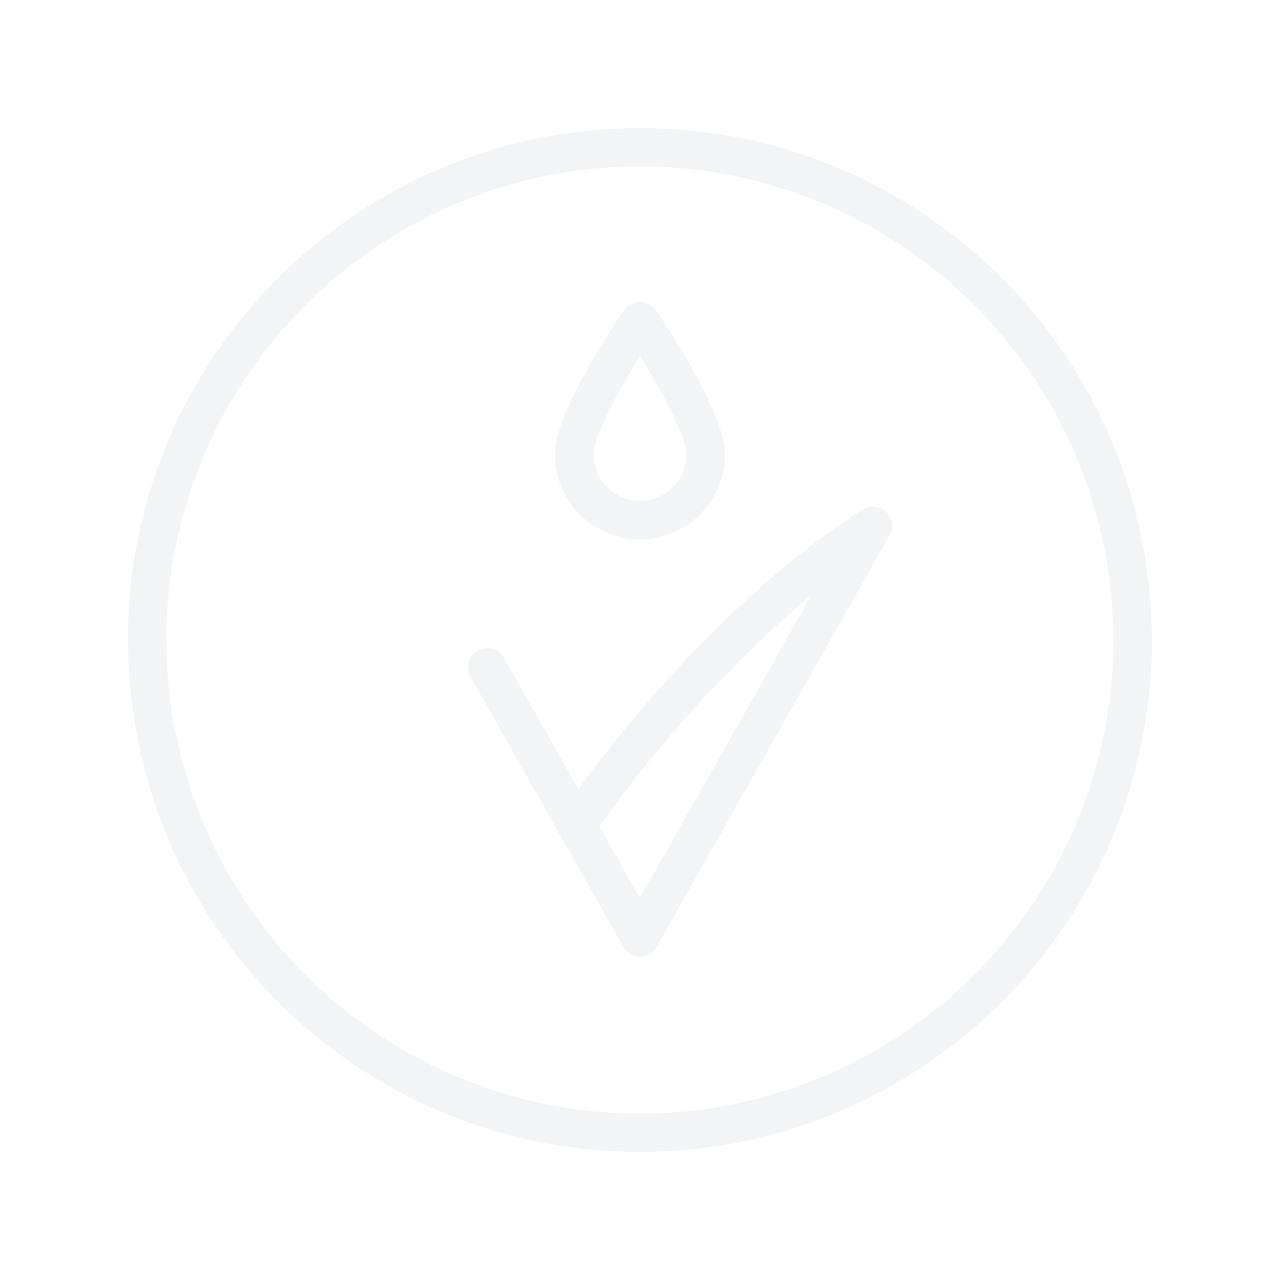 Giorgio Armani Si 30ml Eau De Parfum Gift Set